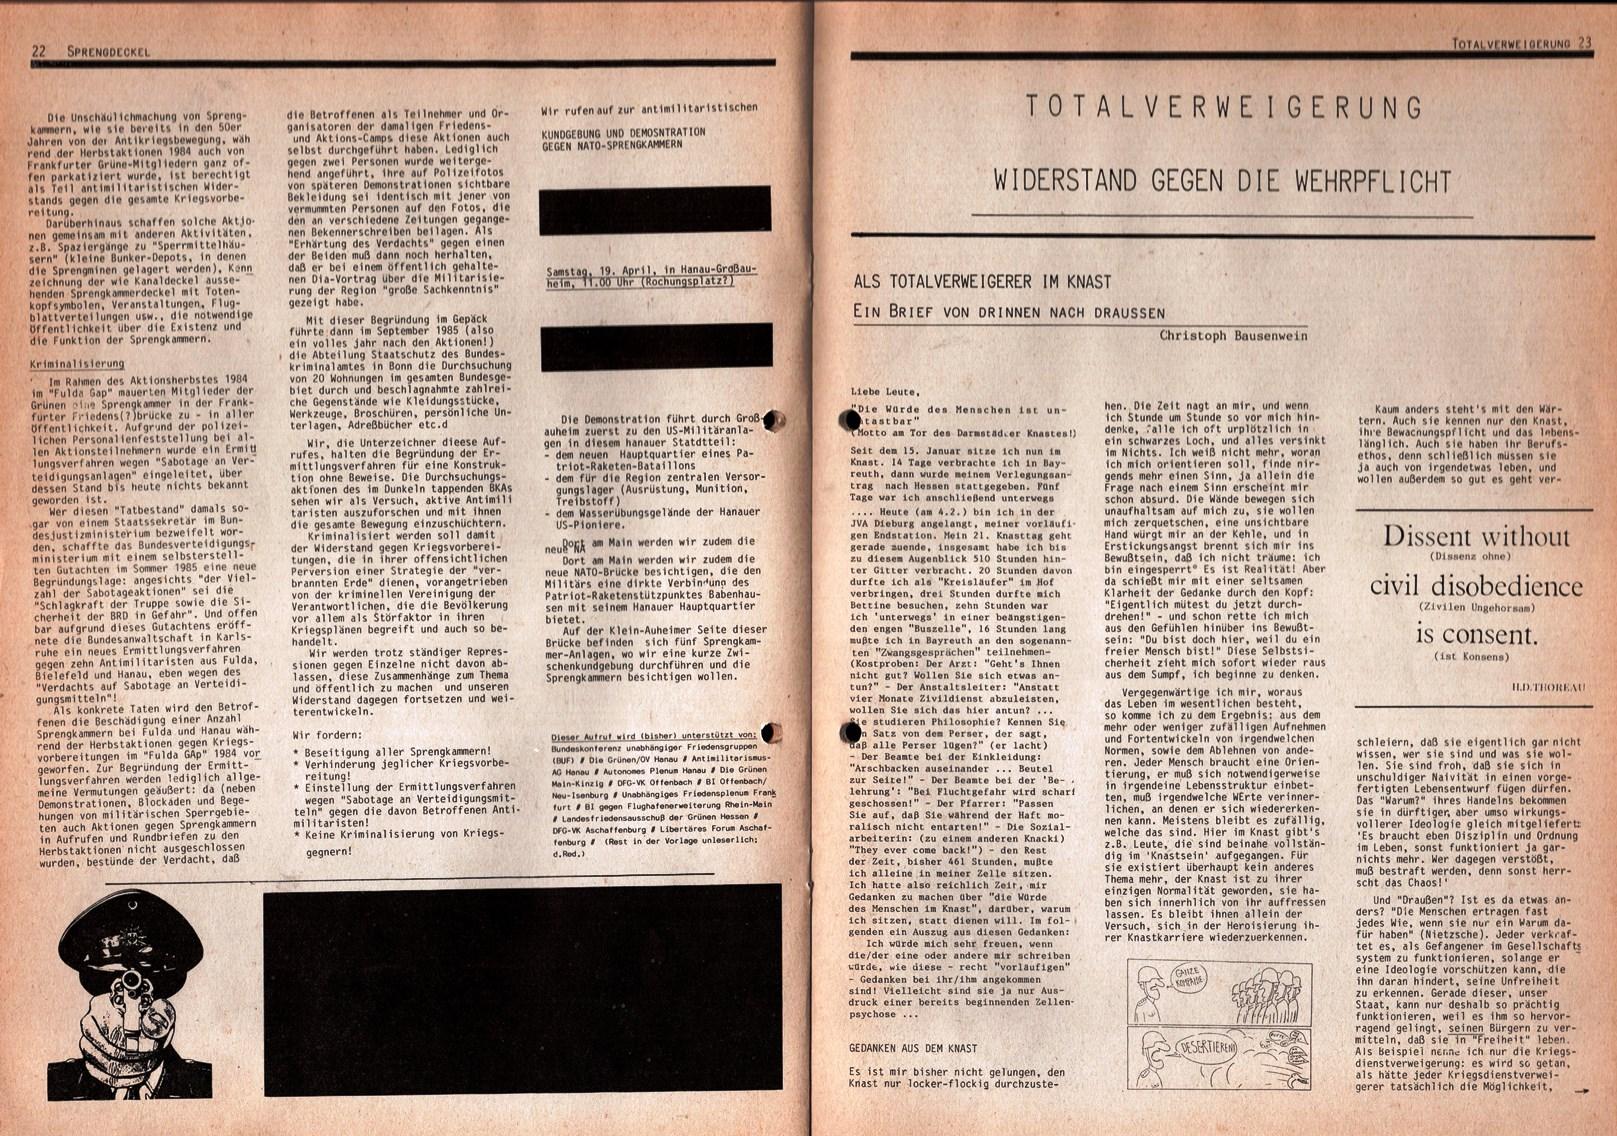 Ziviler_Ungehorsam_1986_004_012